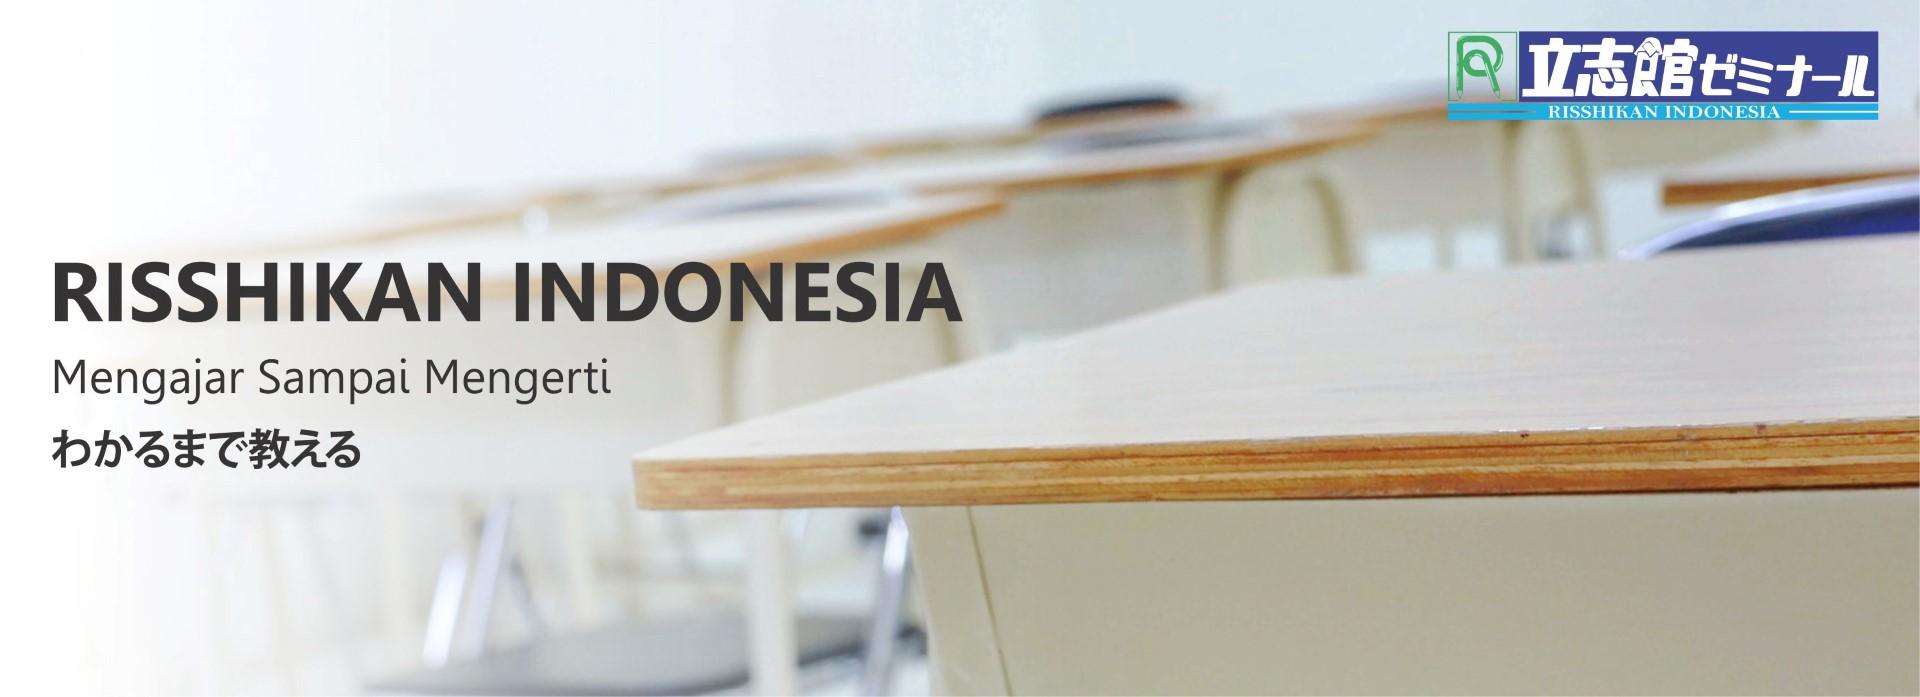 RISSHIKAN INDONESIA